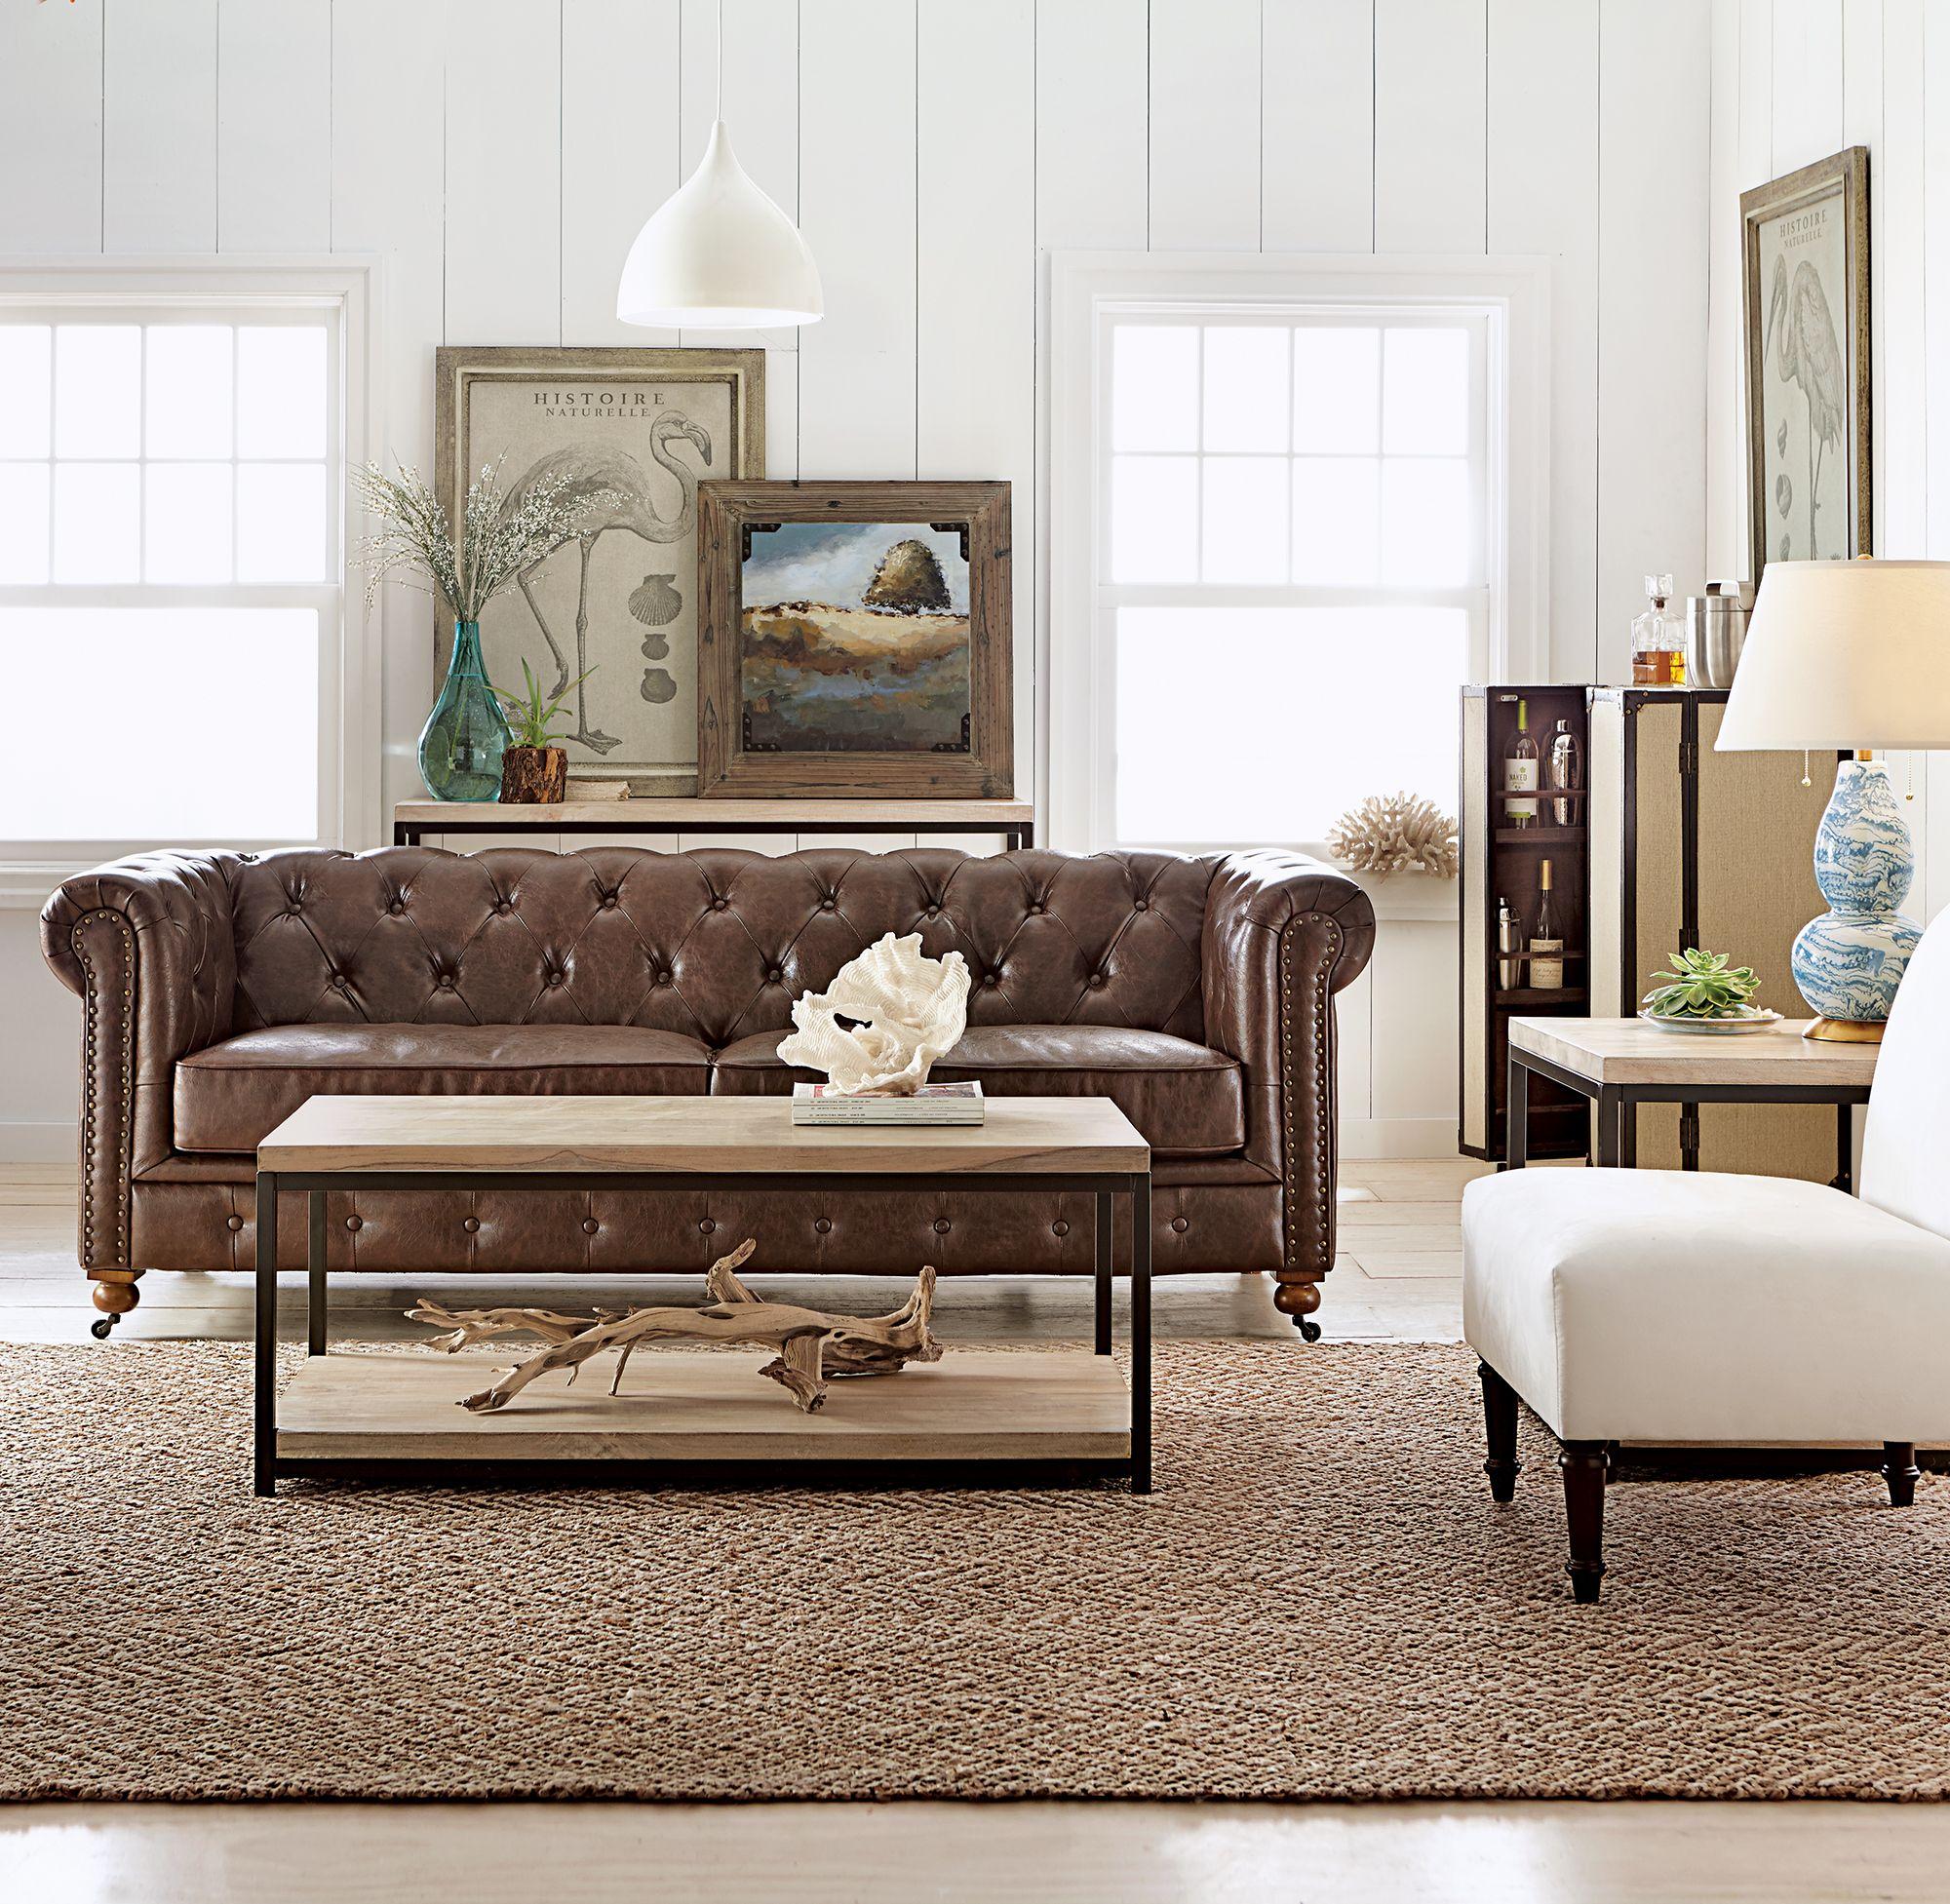 A little coastal vibe in the living room. HomeDecorators.com